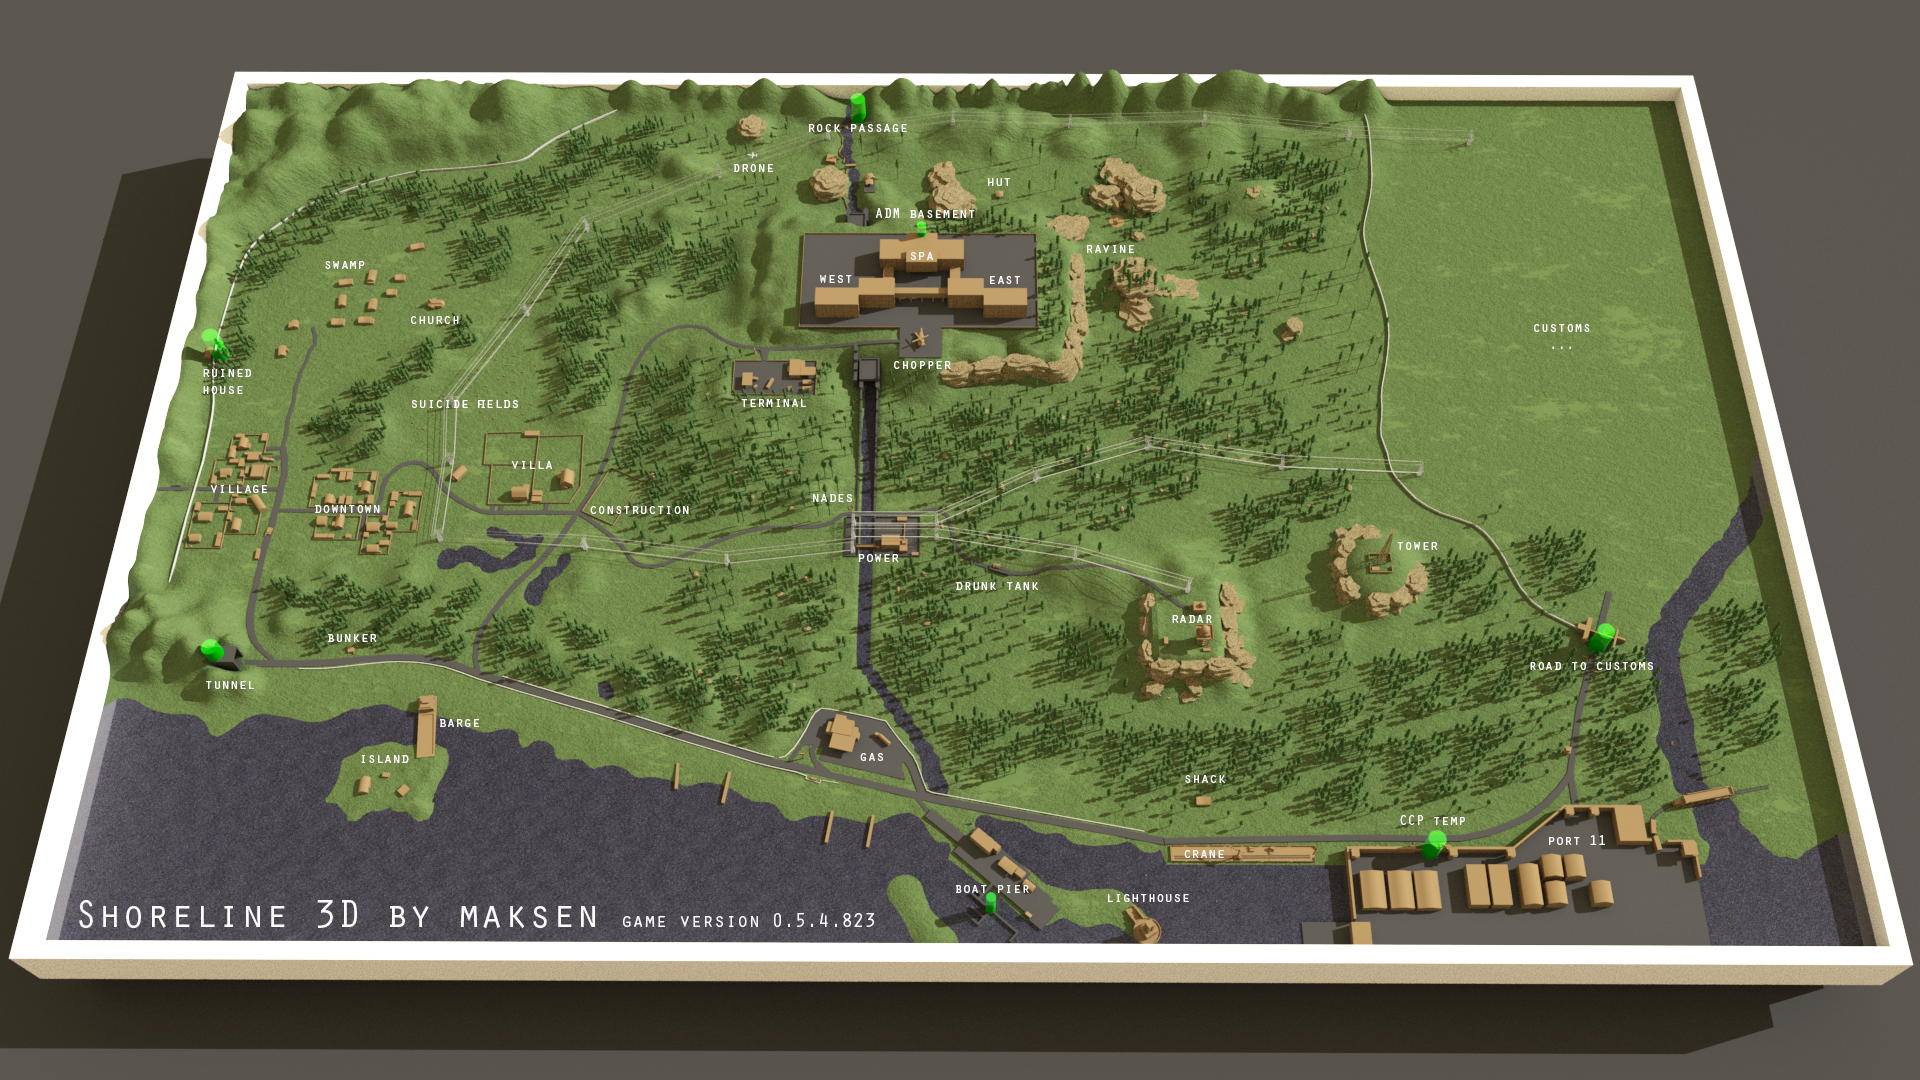 shoreline map?? - General game forum - Escape from Tarkov Forum